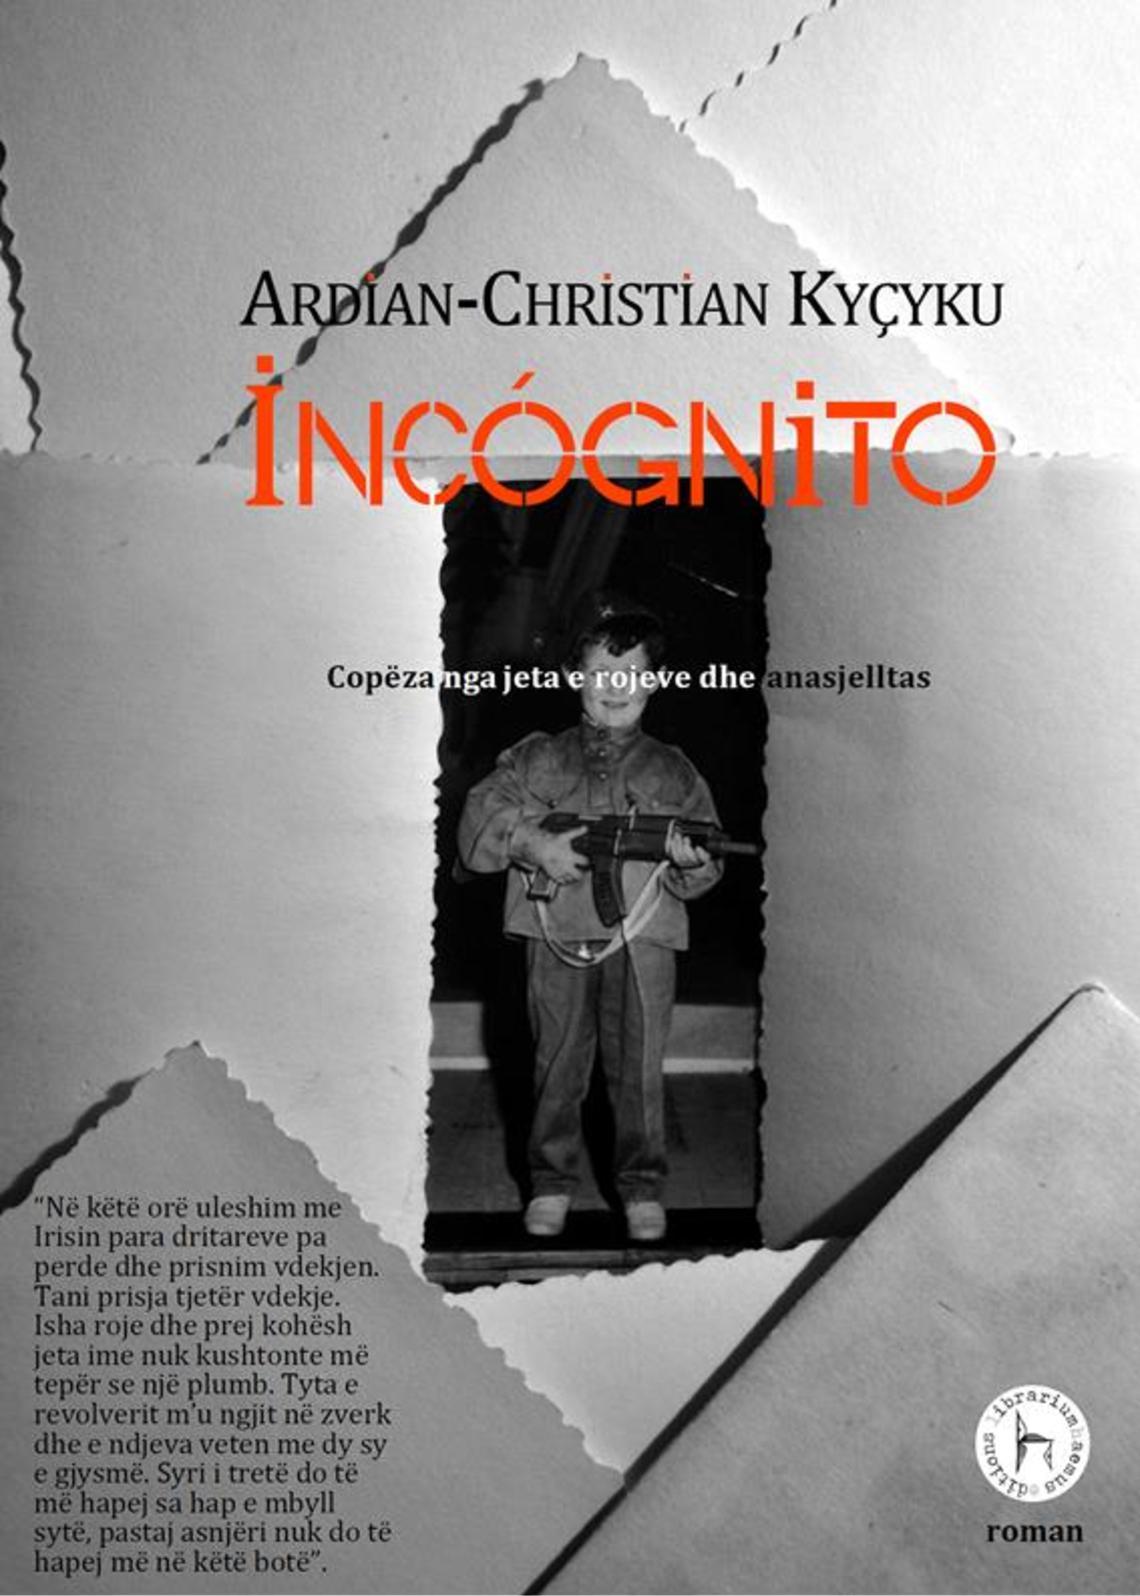 Calaméo - A -Ch  Kyçyku: Incógnito - roman / fragment